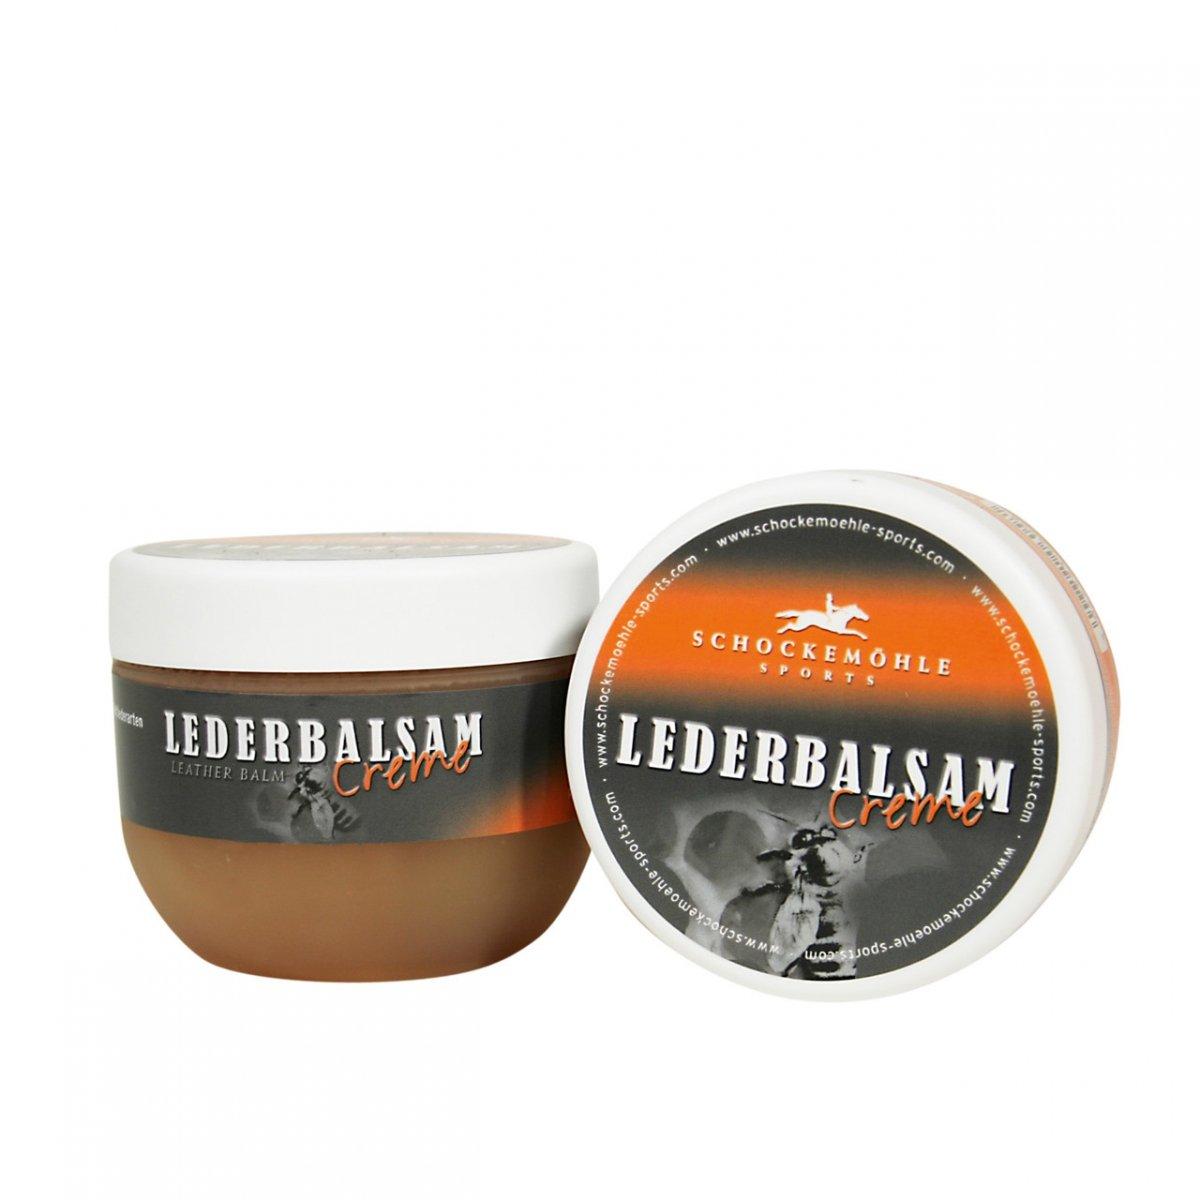 Balsam do skór Lederbalsam Creme SCHOCKEMOHLE 500 ml